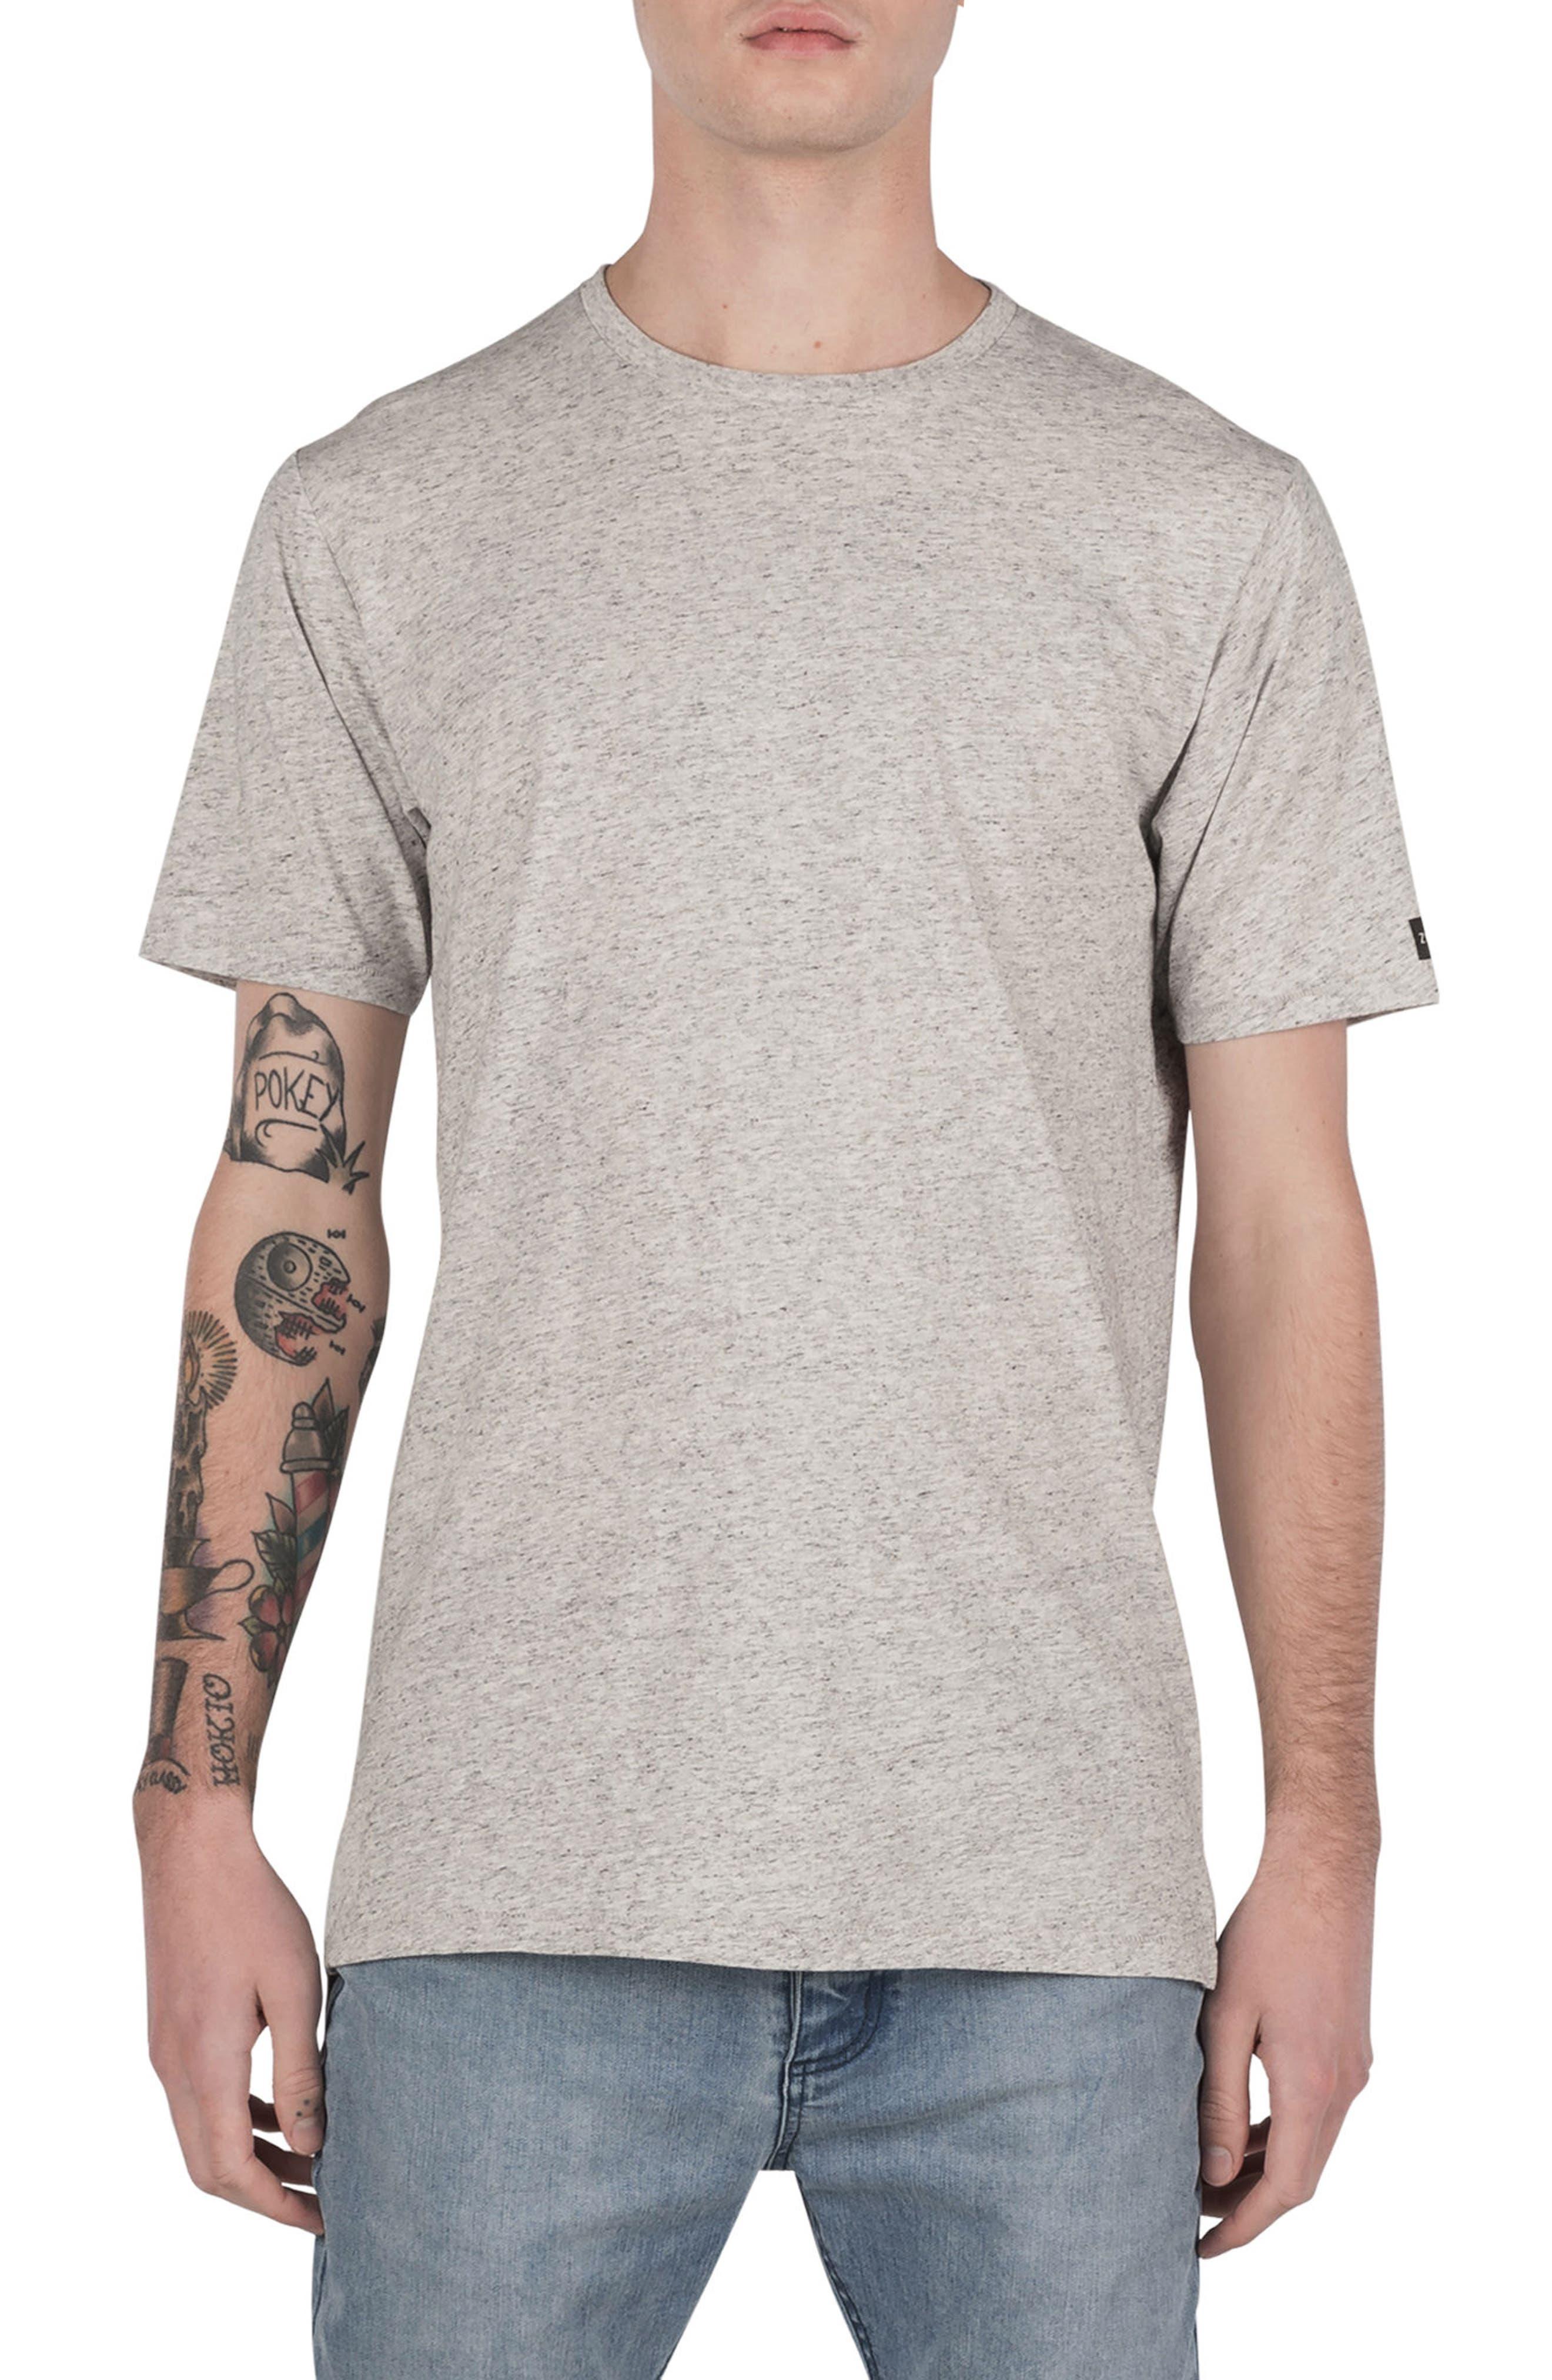 Flintlock T-Shirt,                             Main thumbnail 1, color,                             060